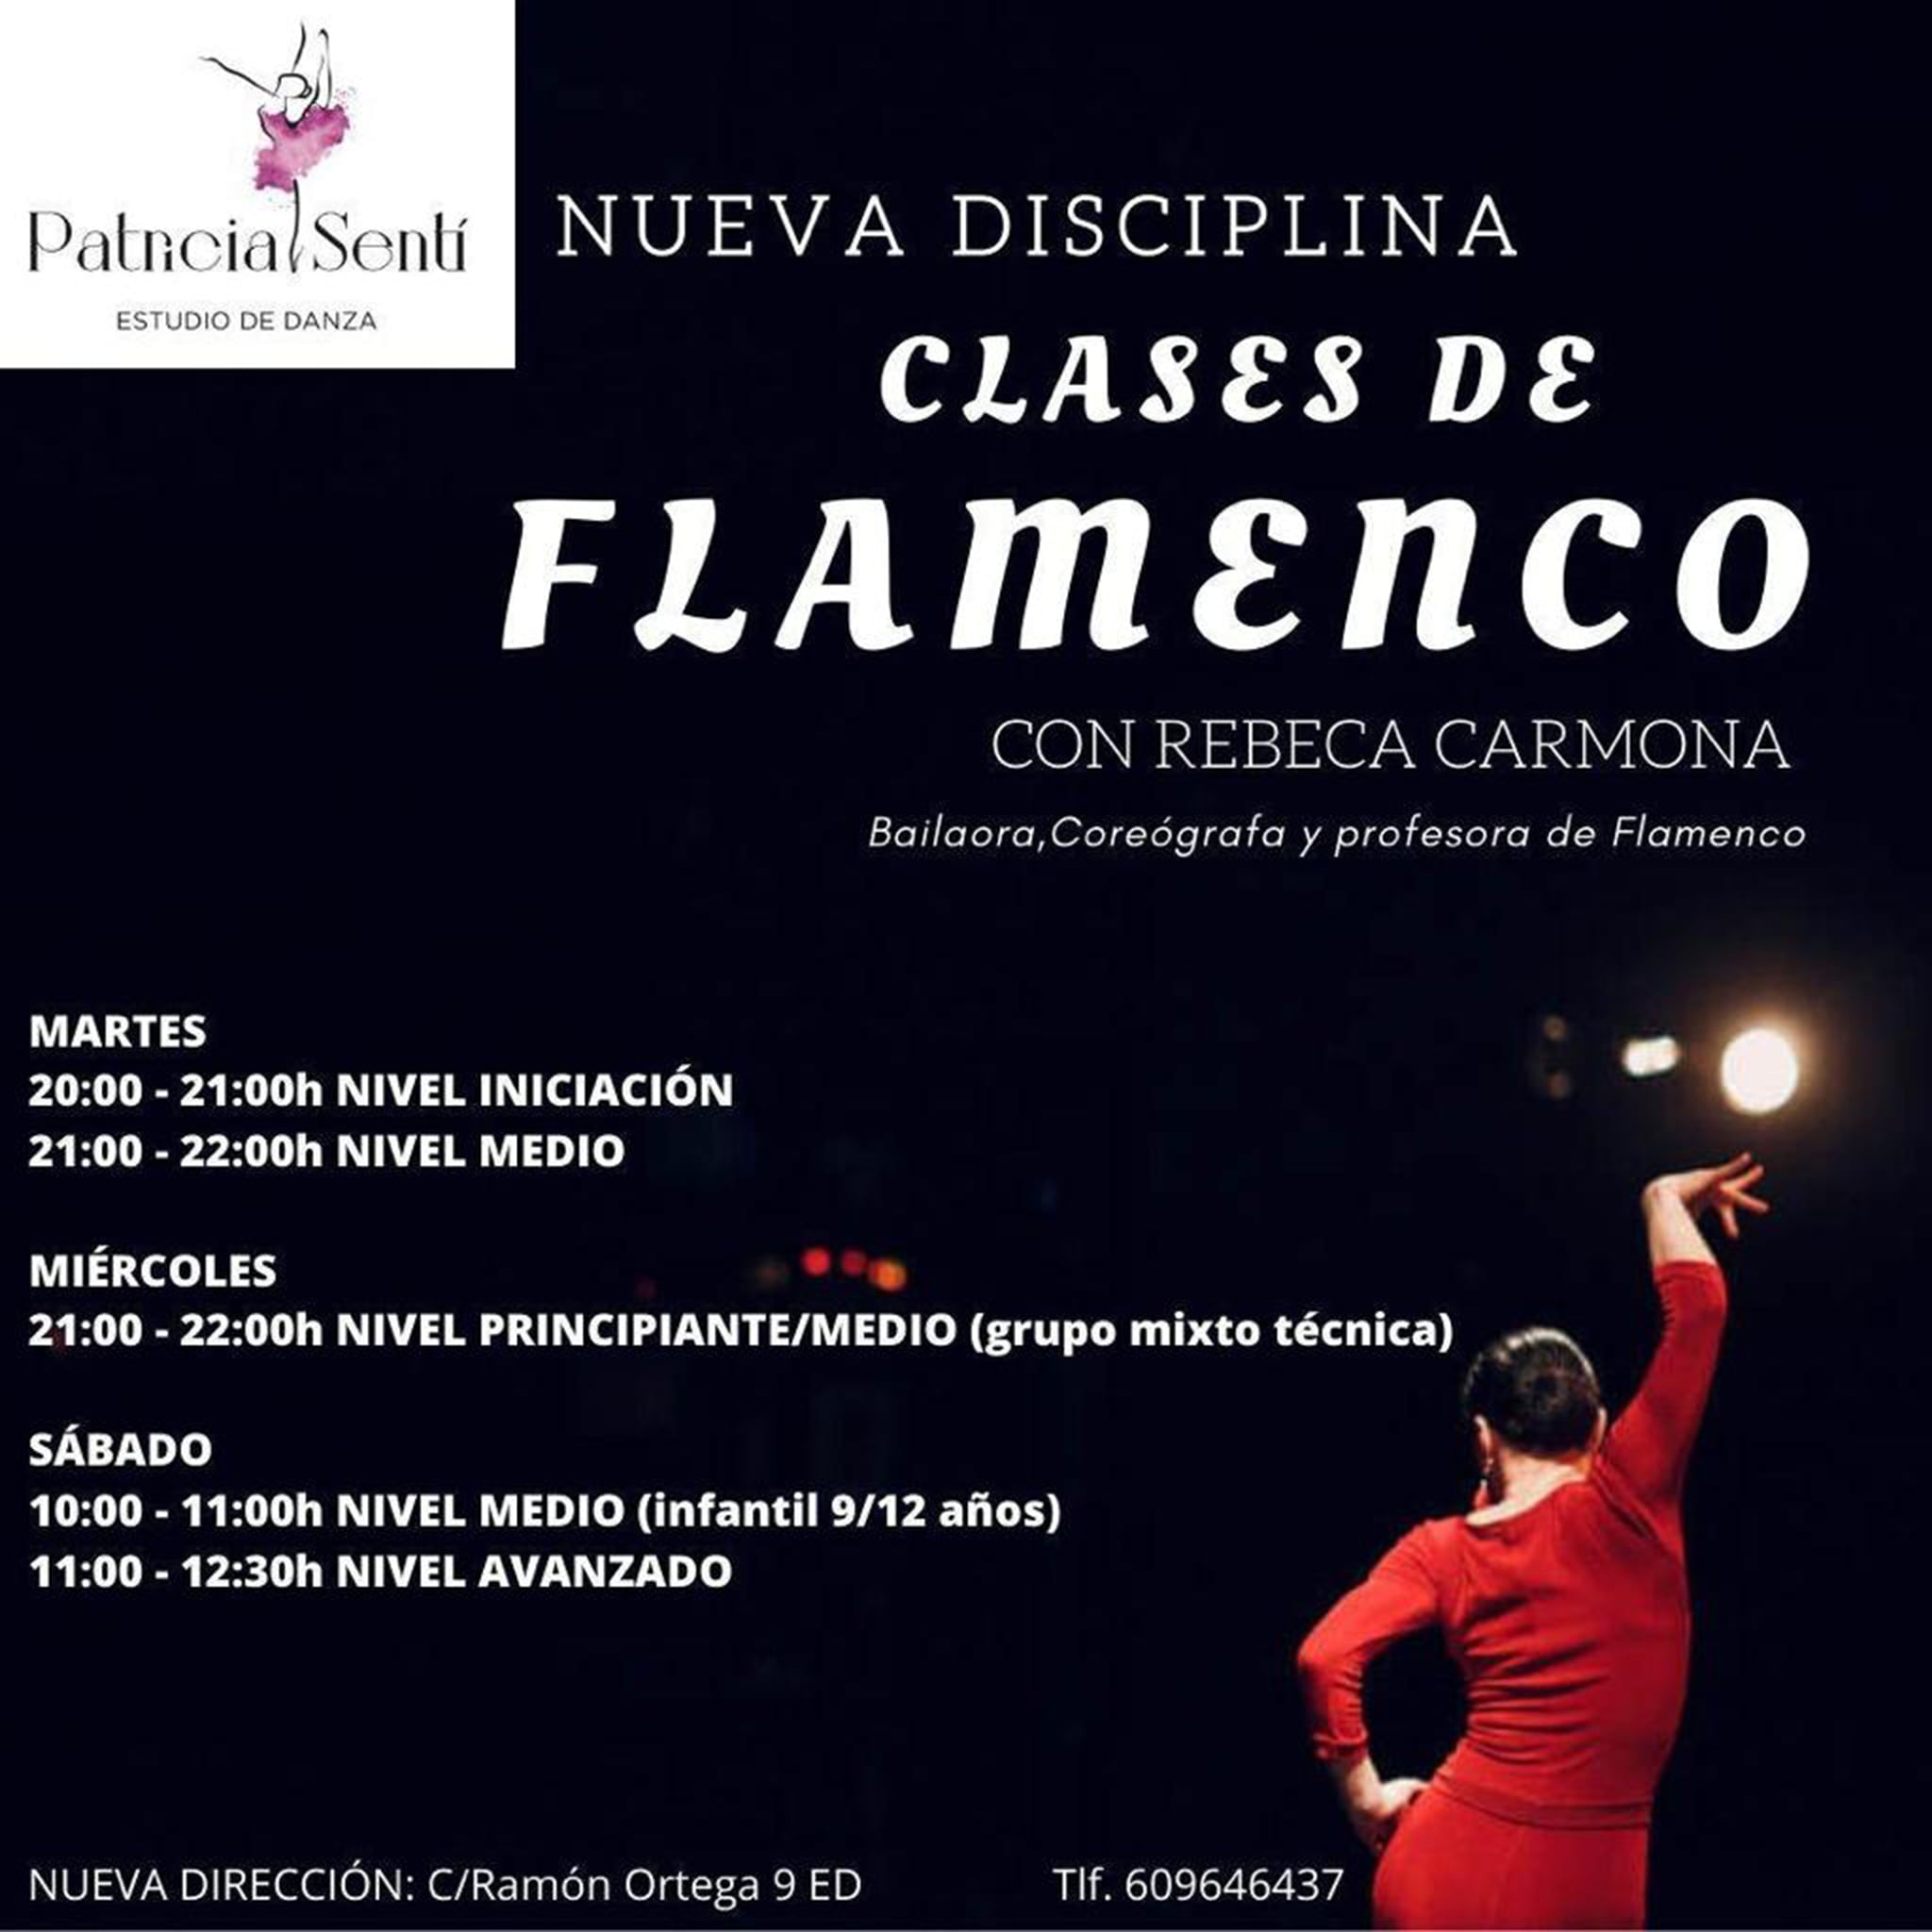 Flamenco classes in Dénia - Patricia Sentí Dance Studio